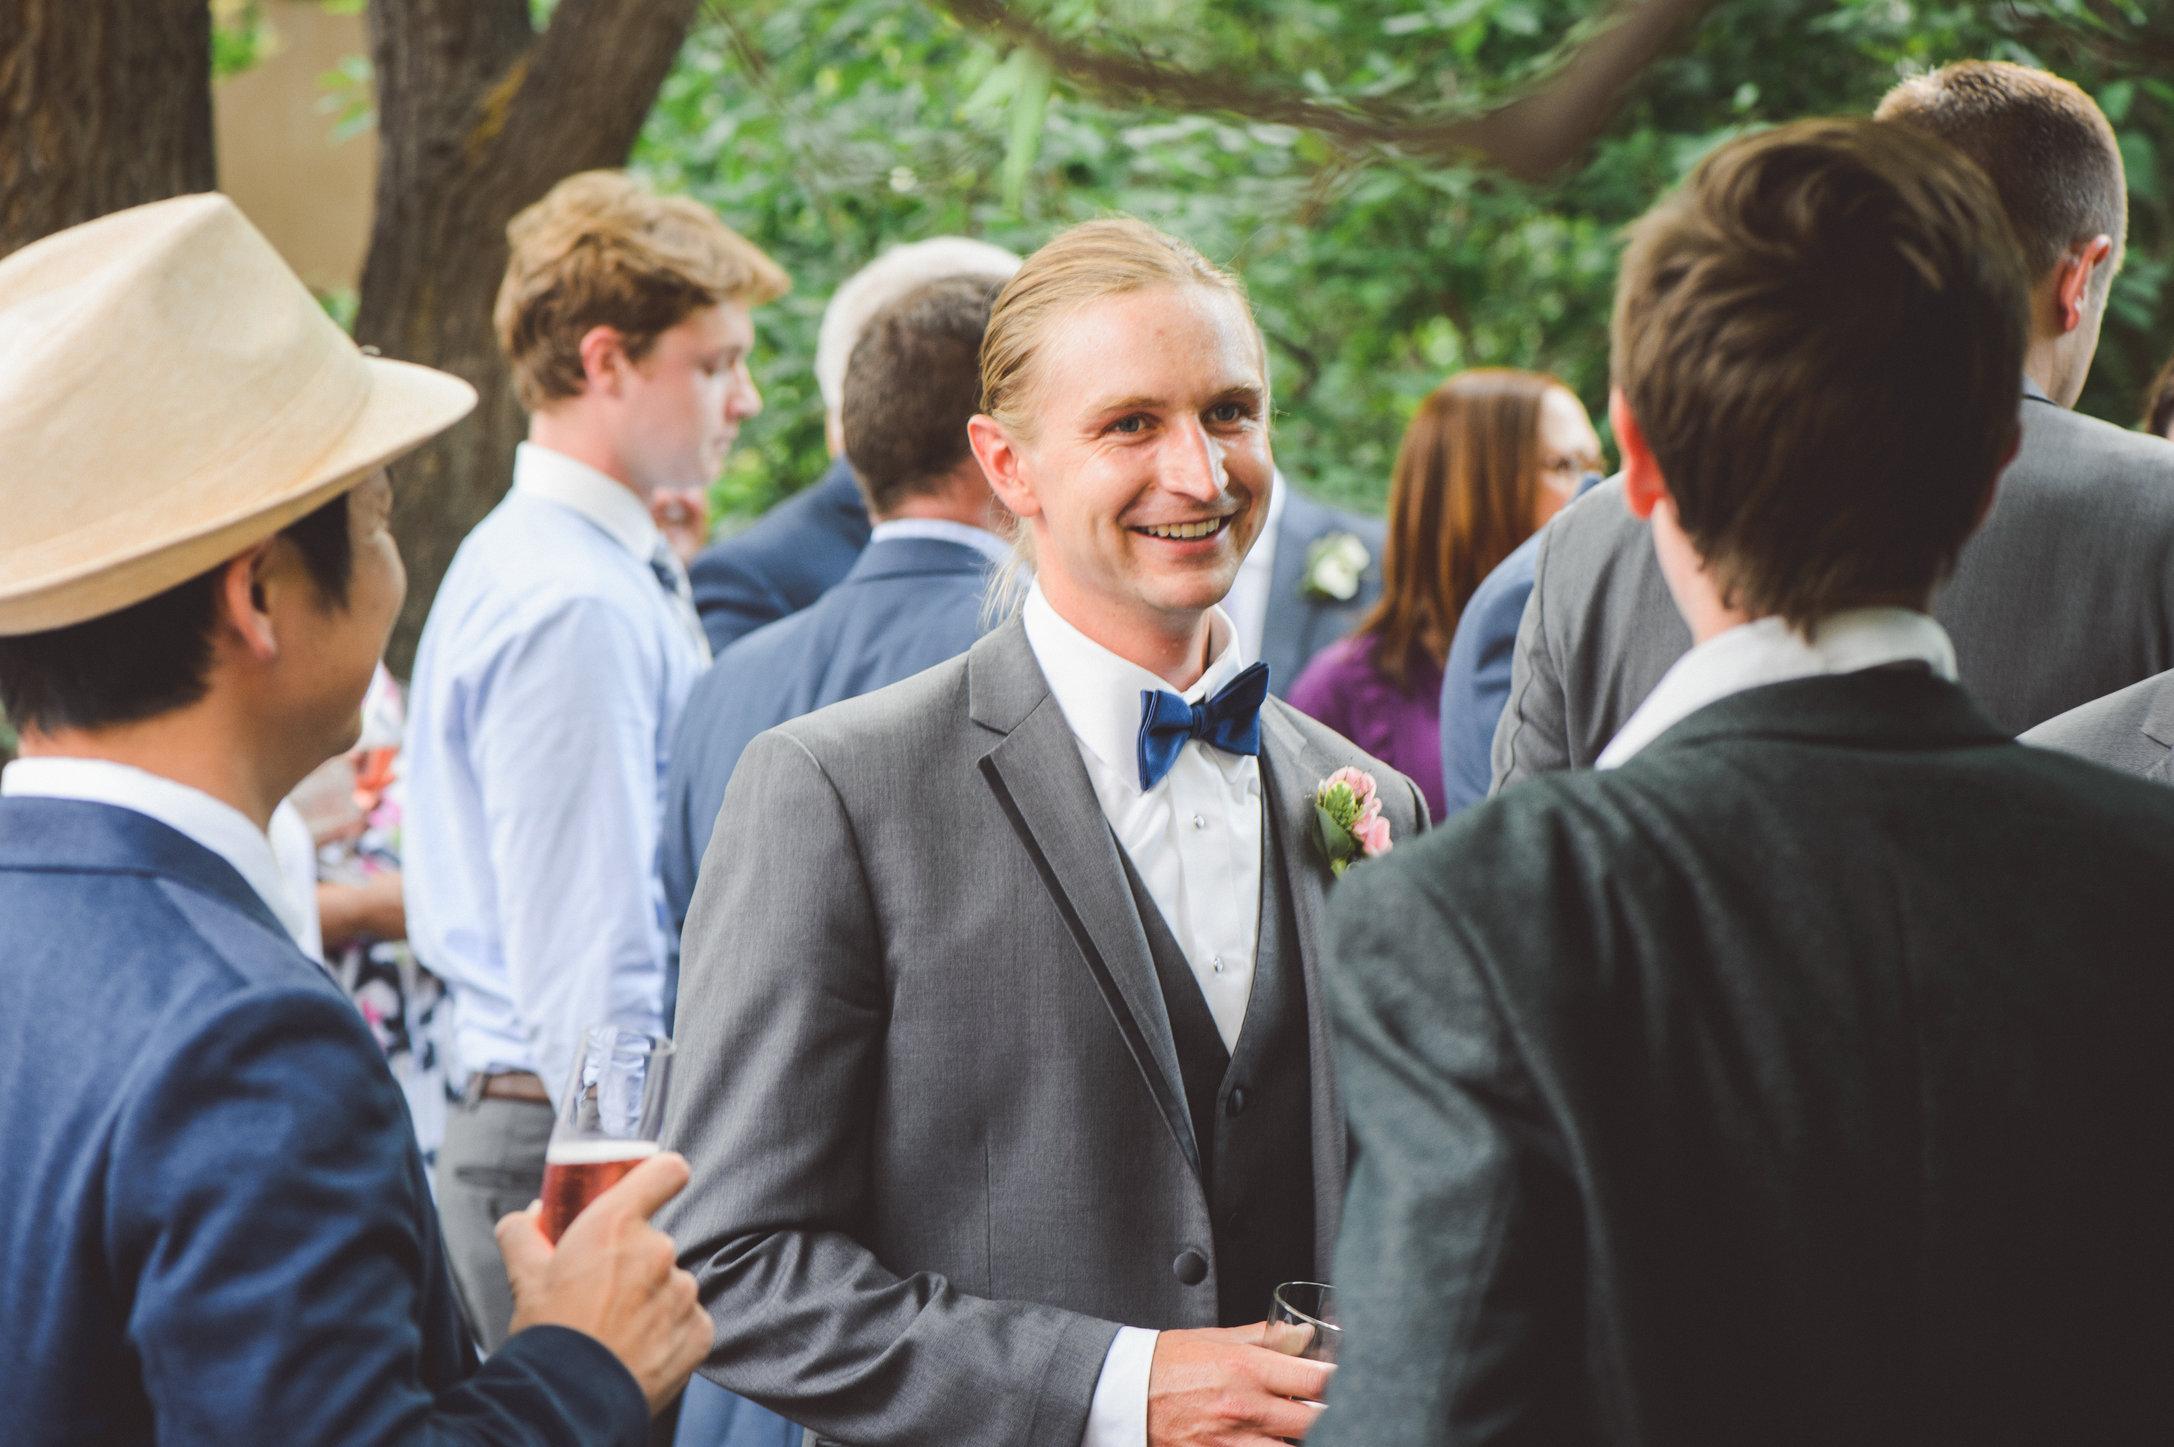 SandC-wedding-424.jpg